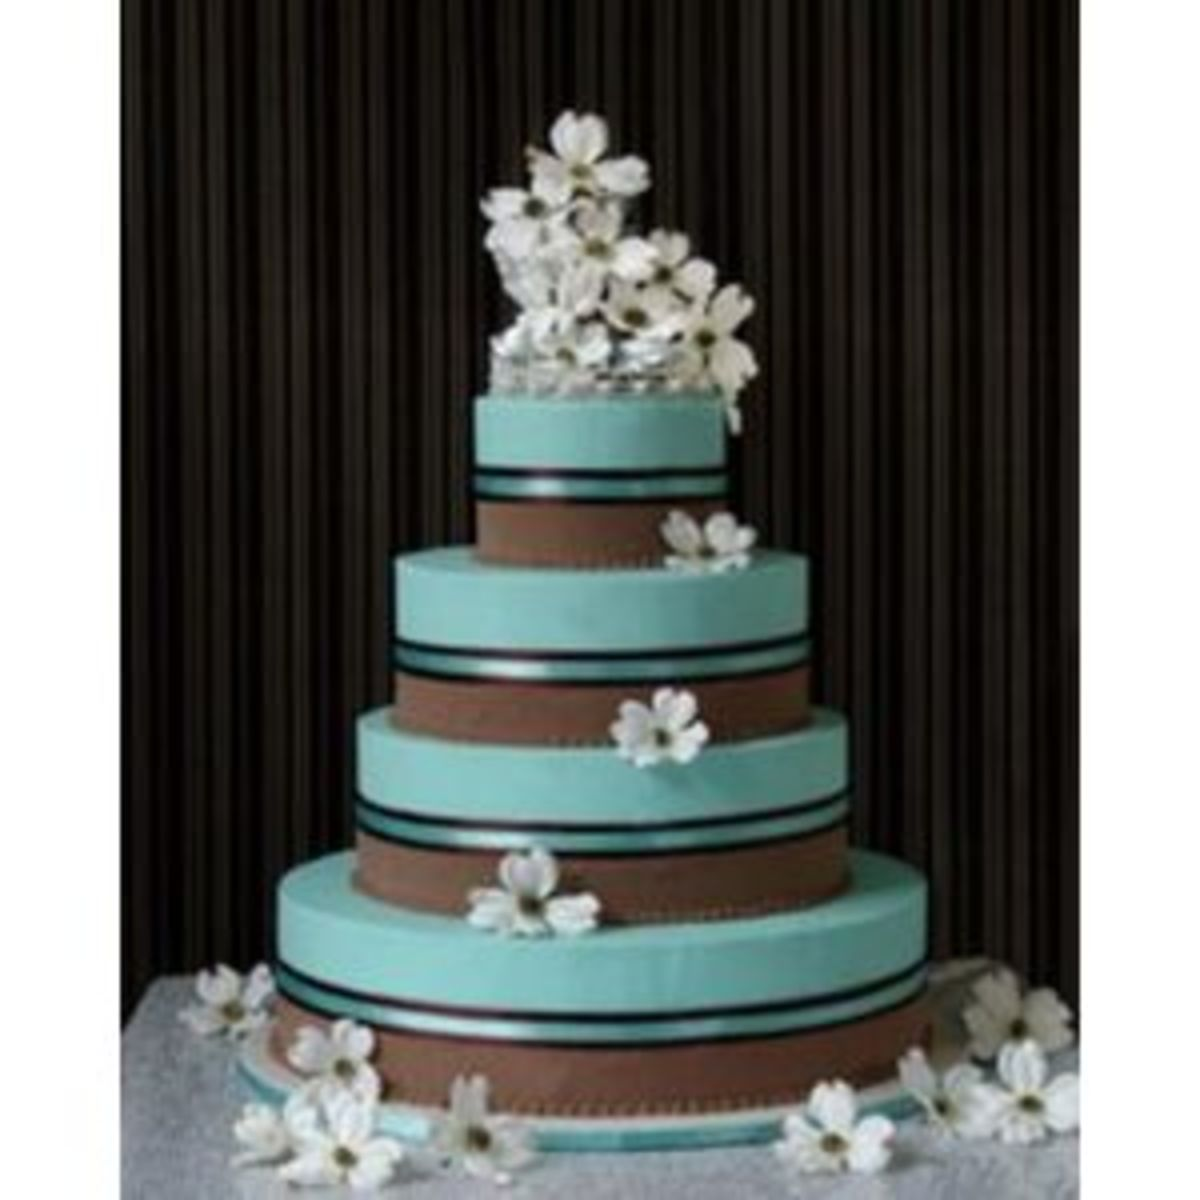 Turquoise and chocolate brown wedding cake theme [polyvore.com]